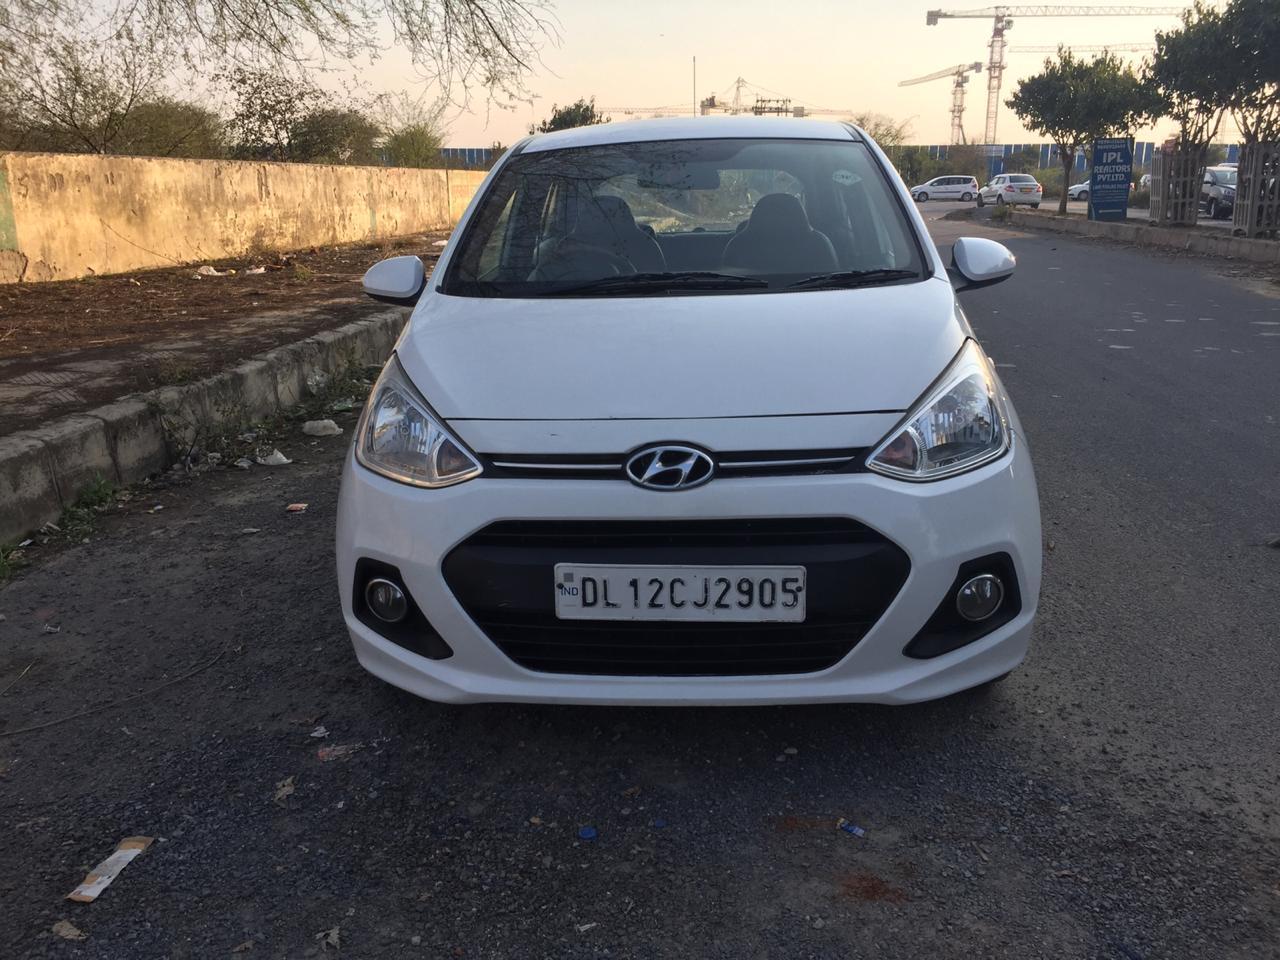 Secondhand I-10 Grand Magna-cng car in Dwarka and Uttam Nagar